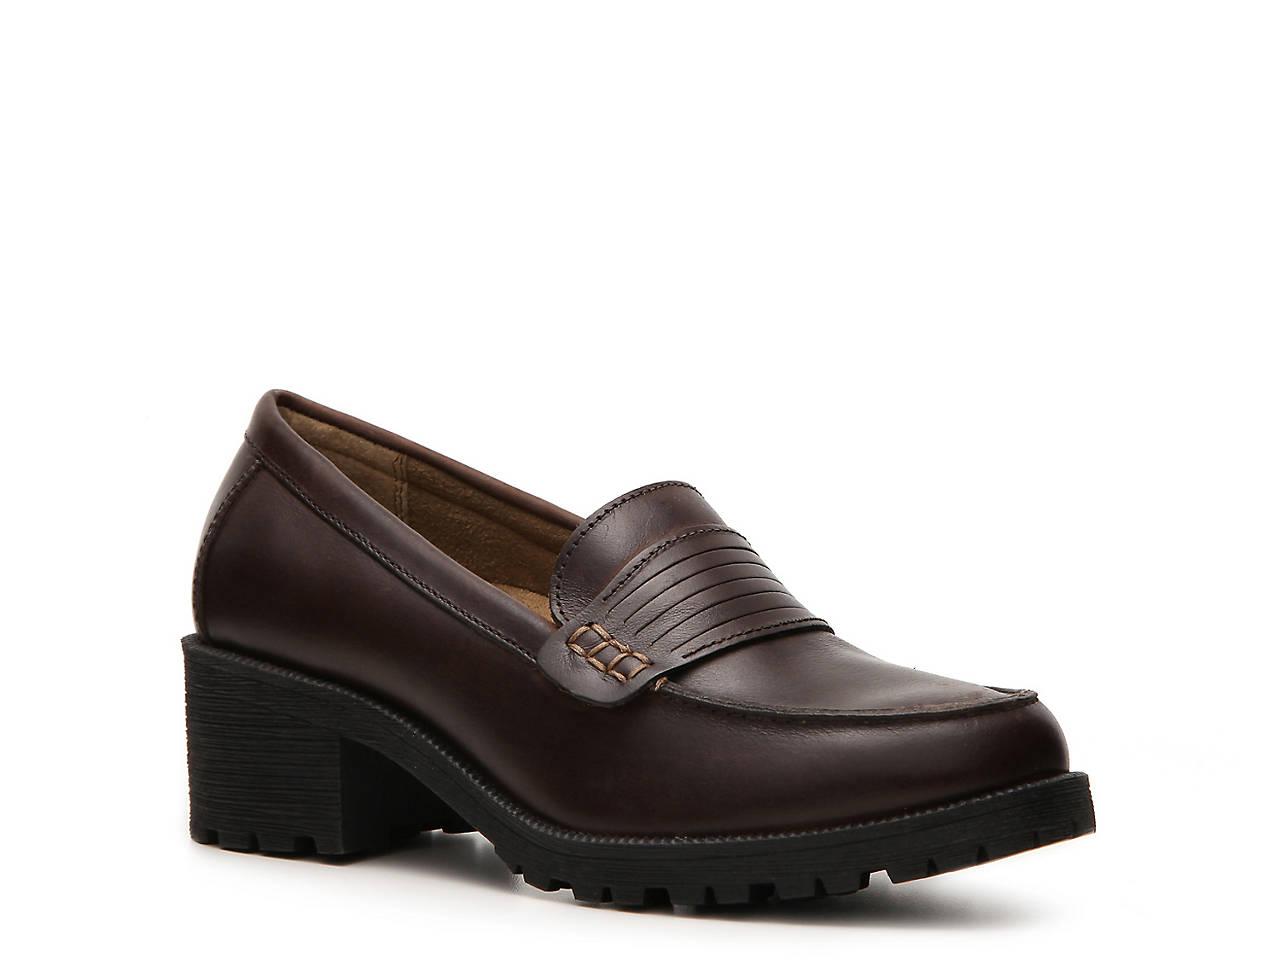 9d4d7fcb9f Eastland Newbury Loafer Women s Shoes